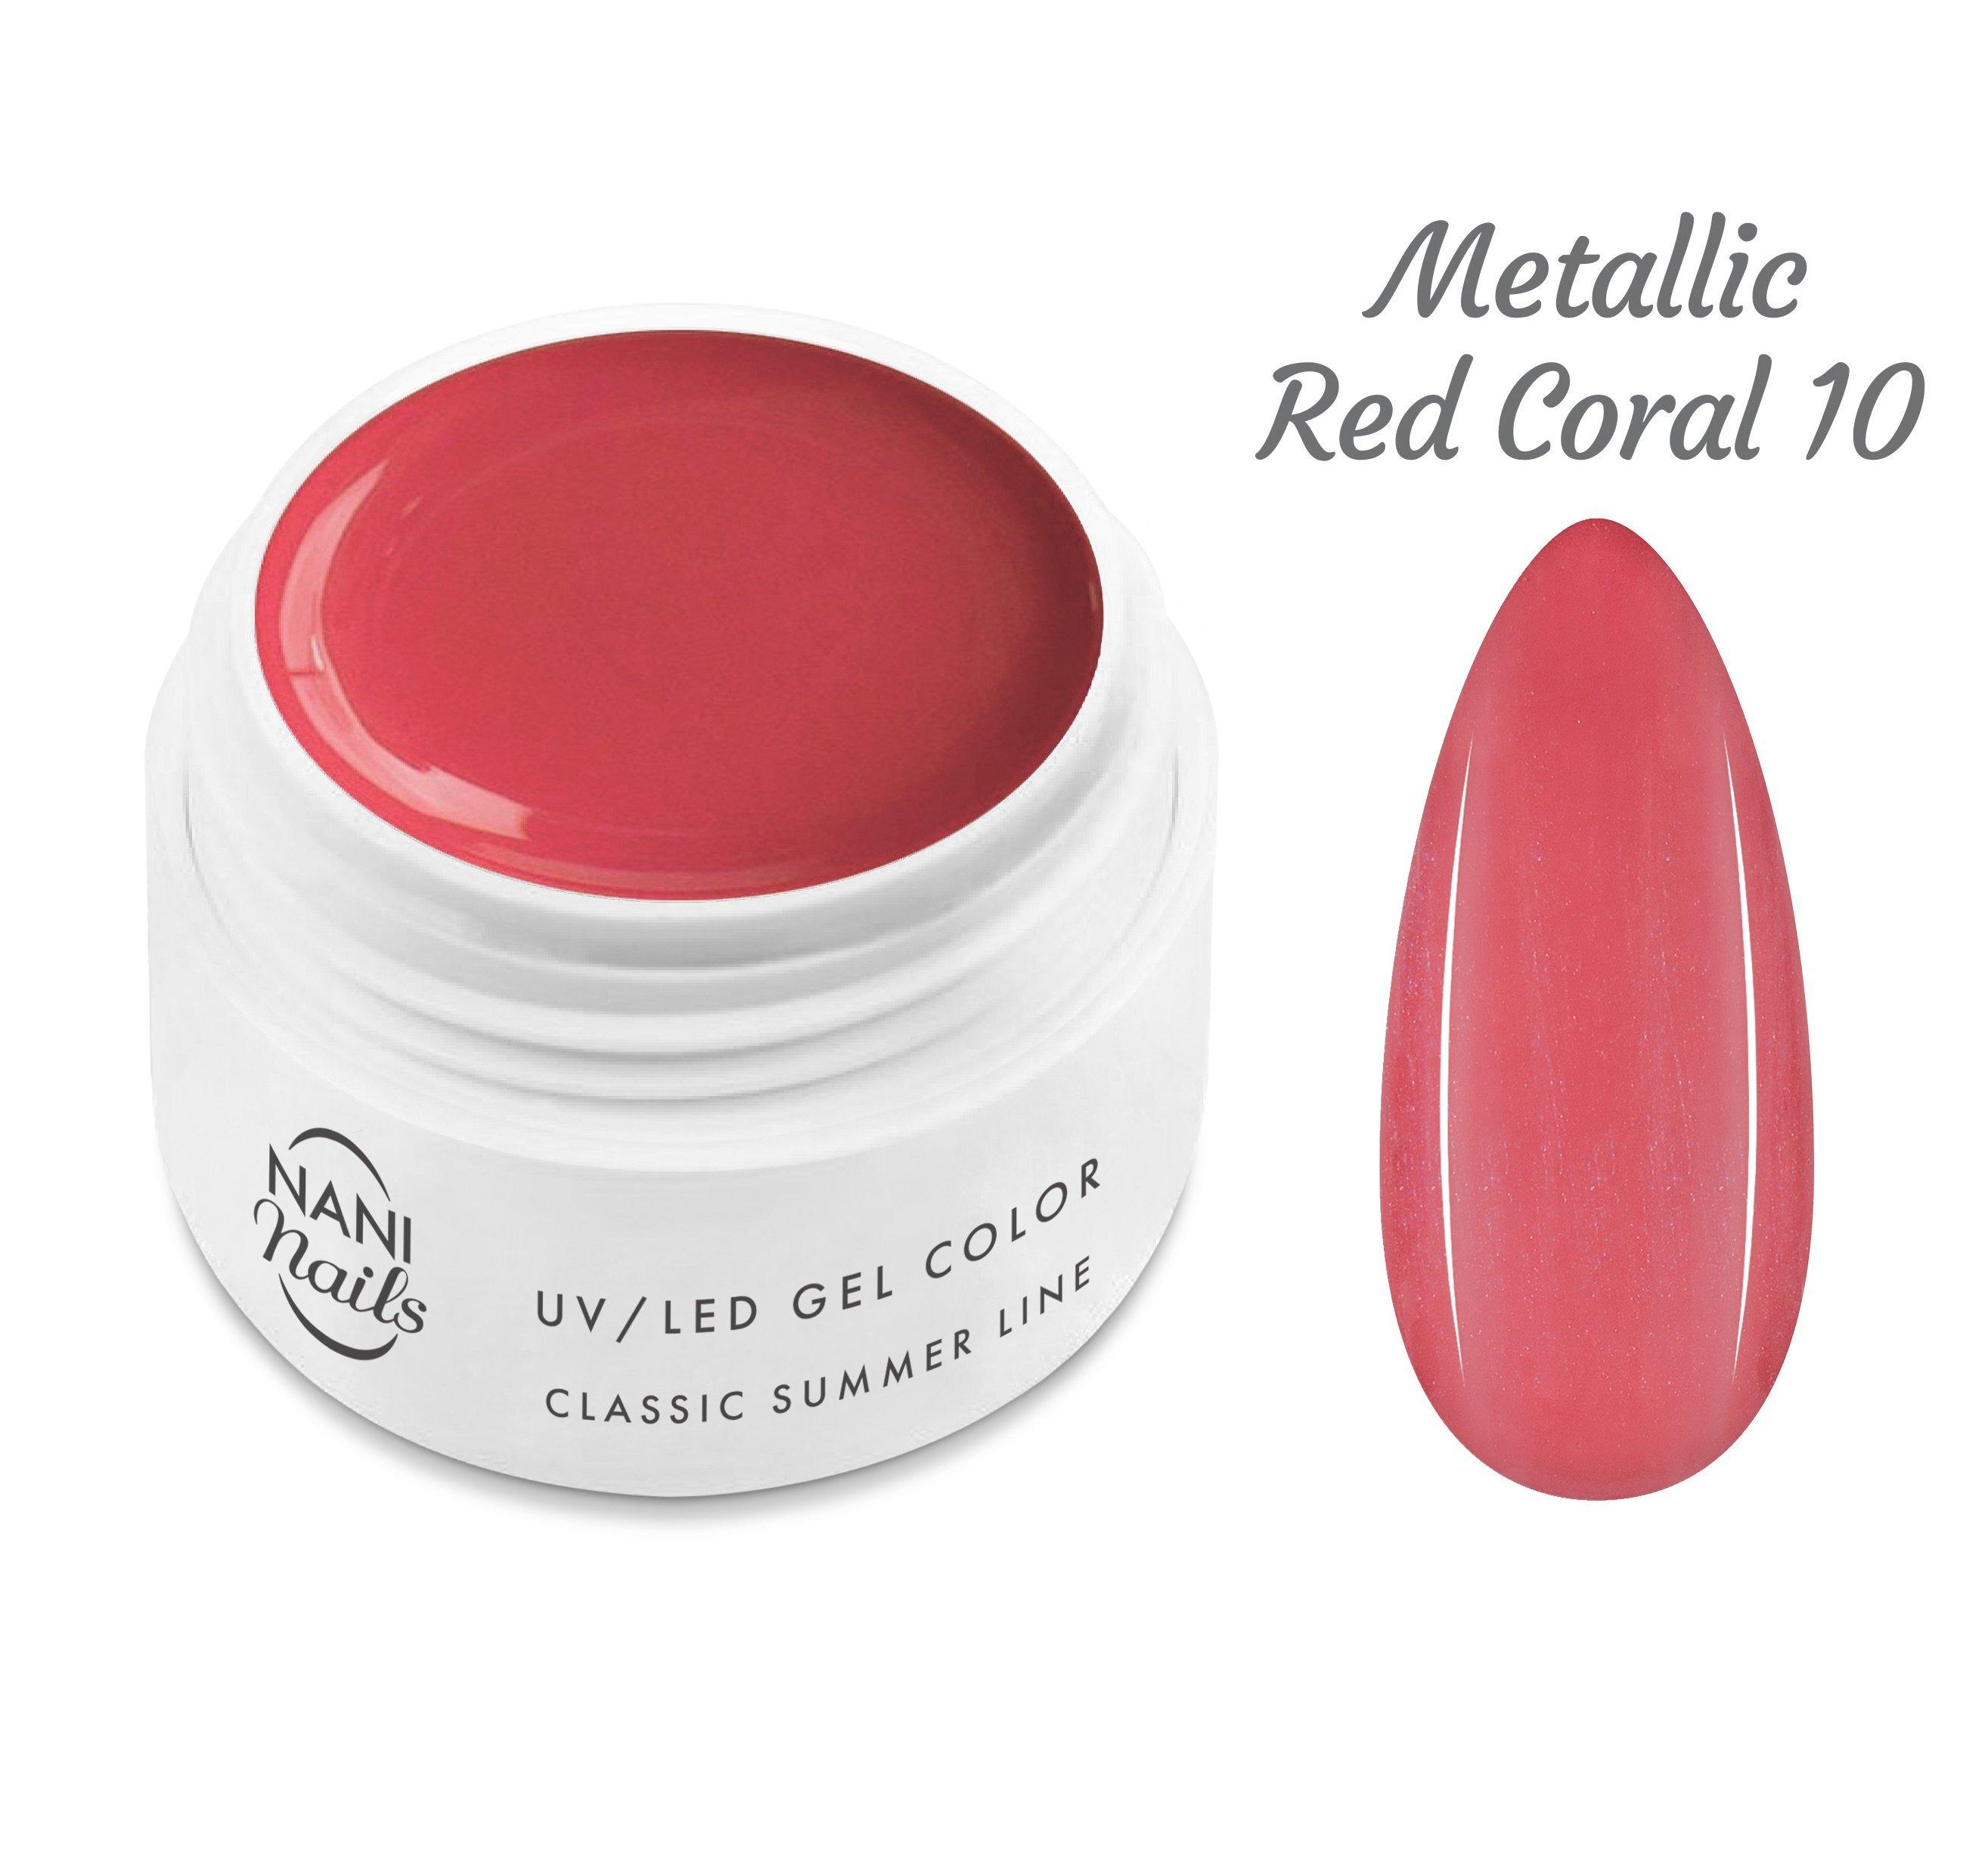 NANI UV gél Classic Summer Line 5 ml - Metallic Red Coral